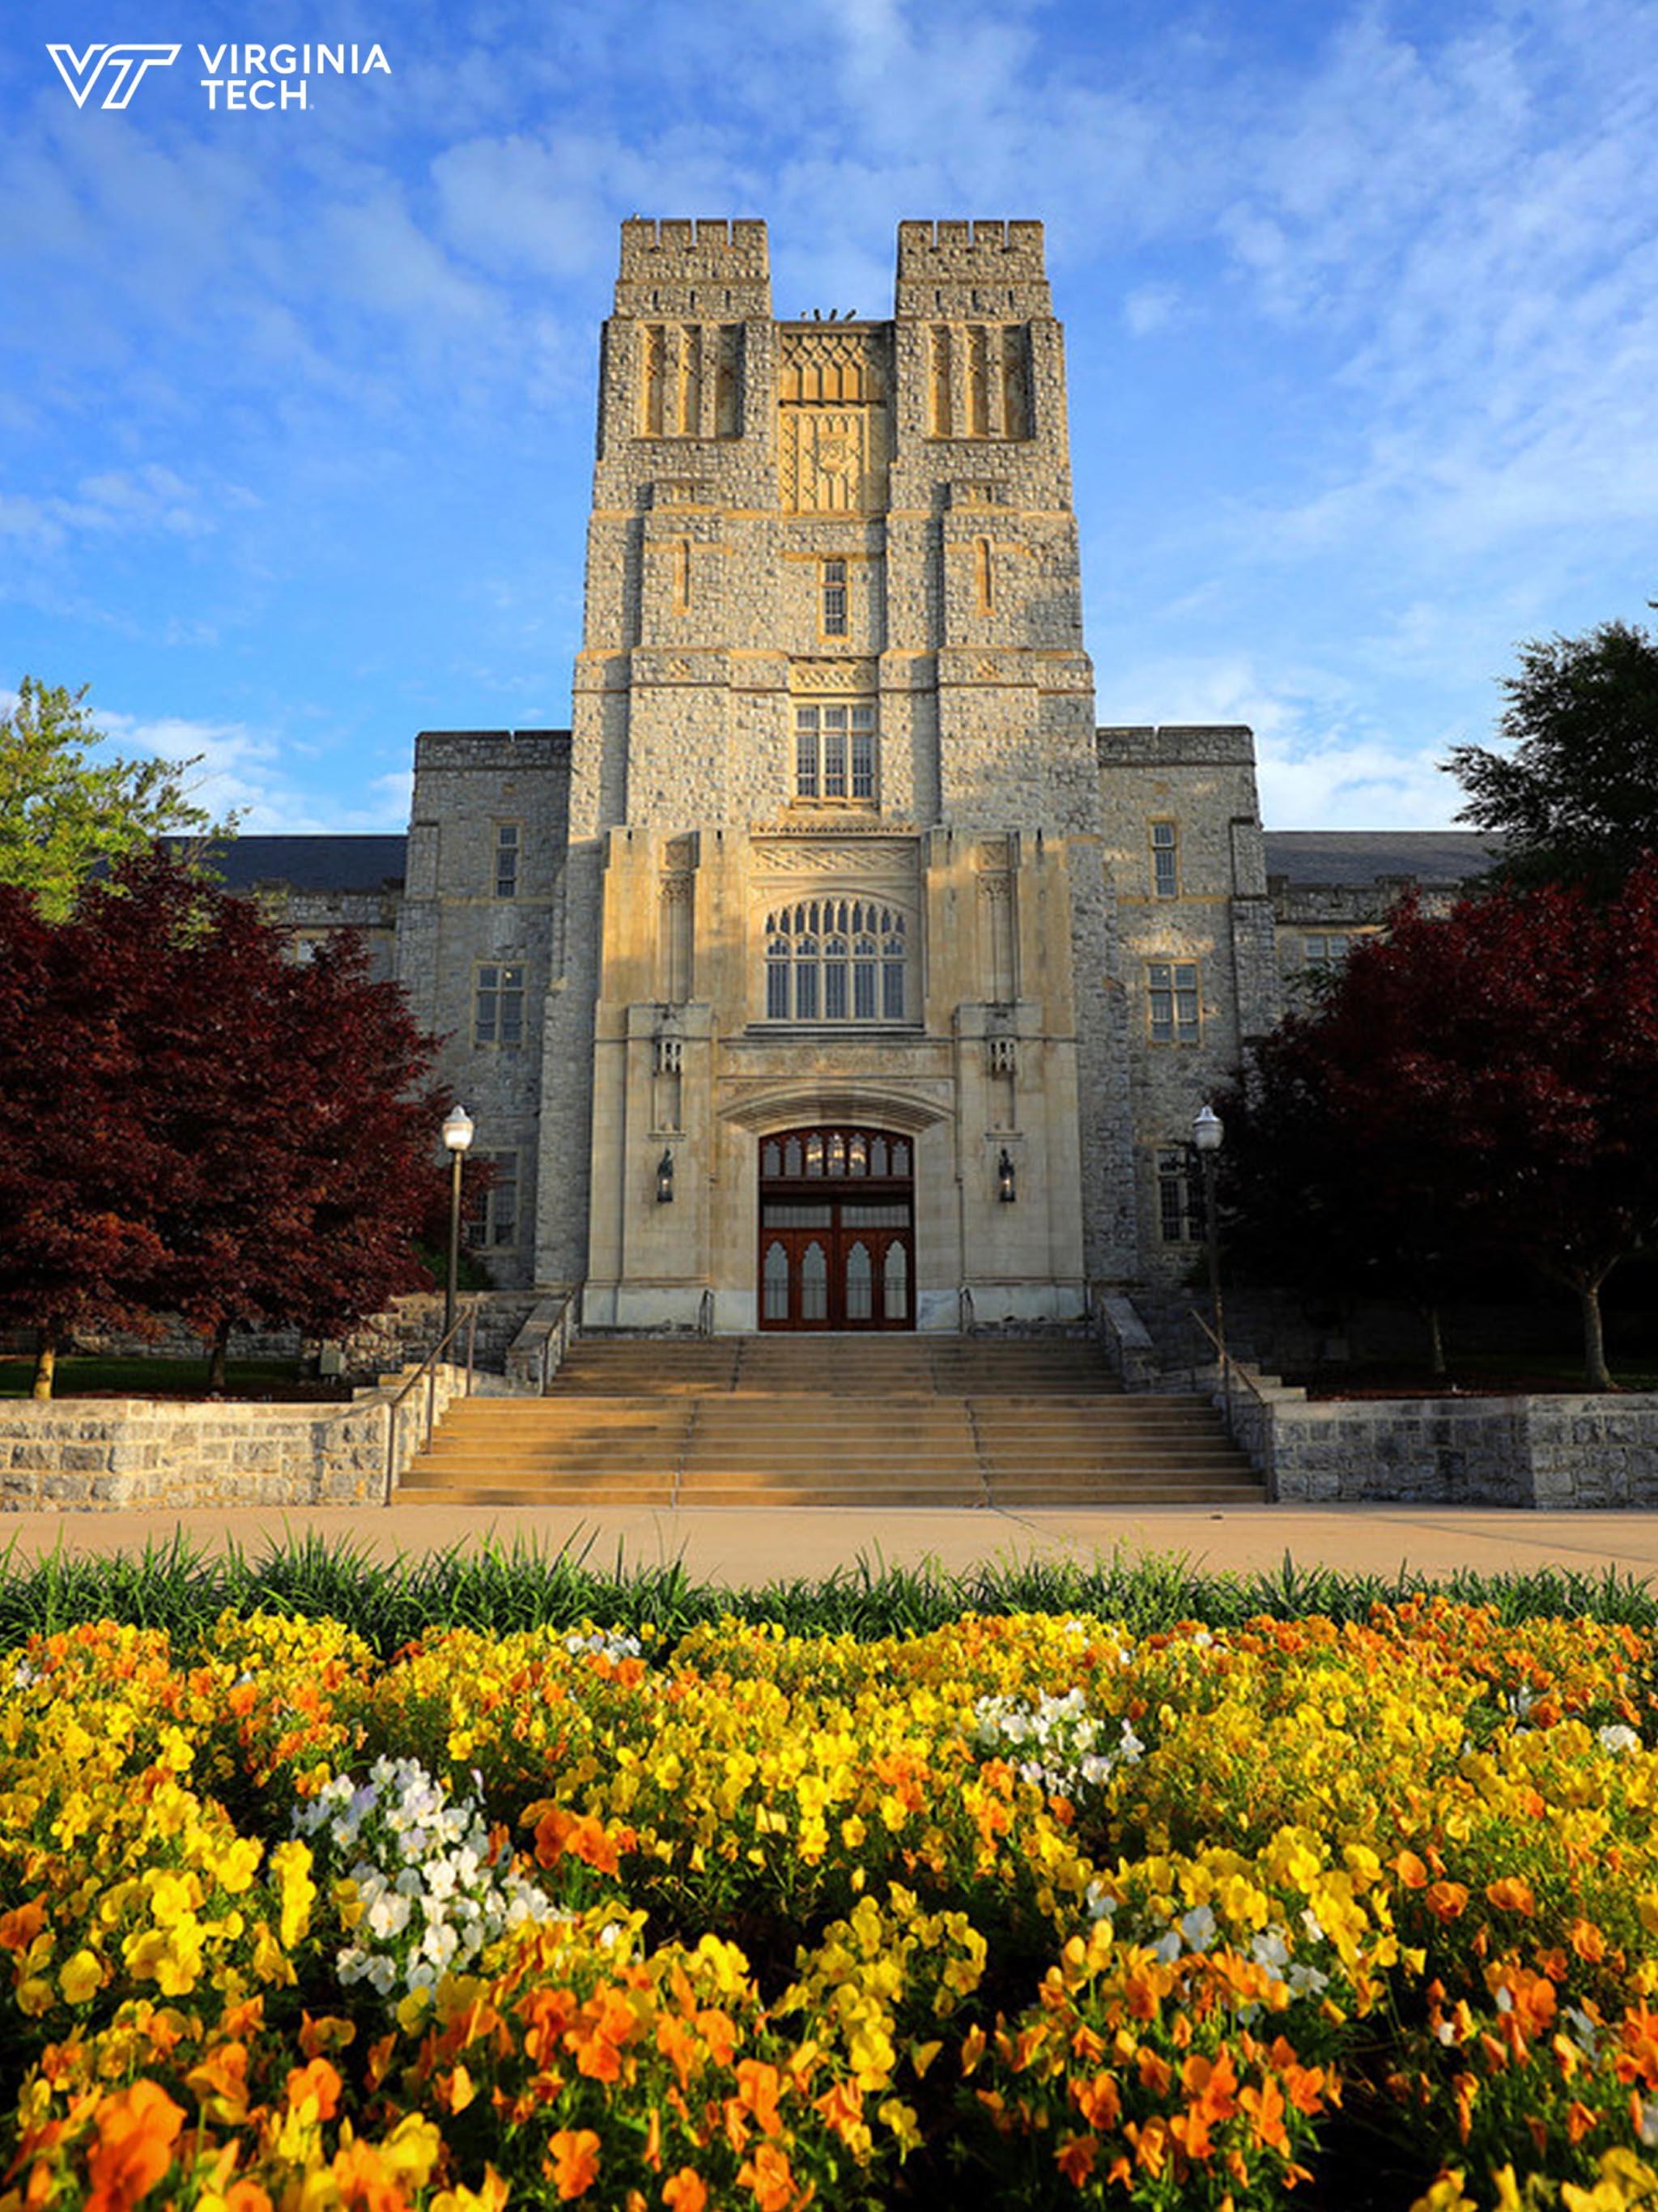 Backgrounds Alumni Relations Virginia Tech